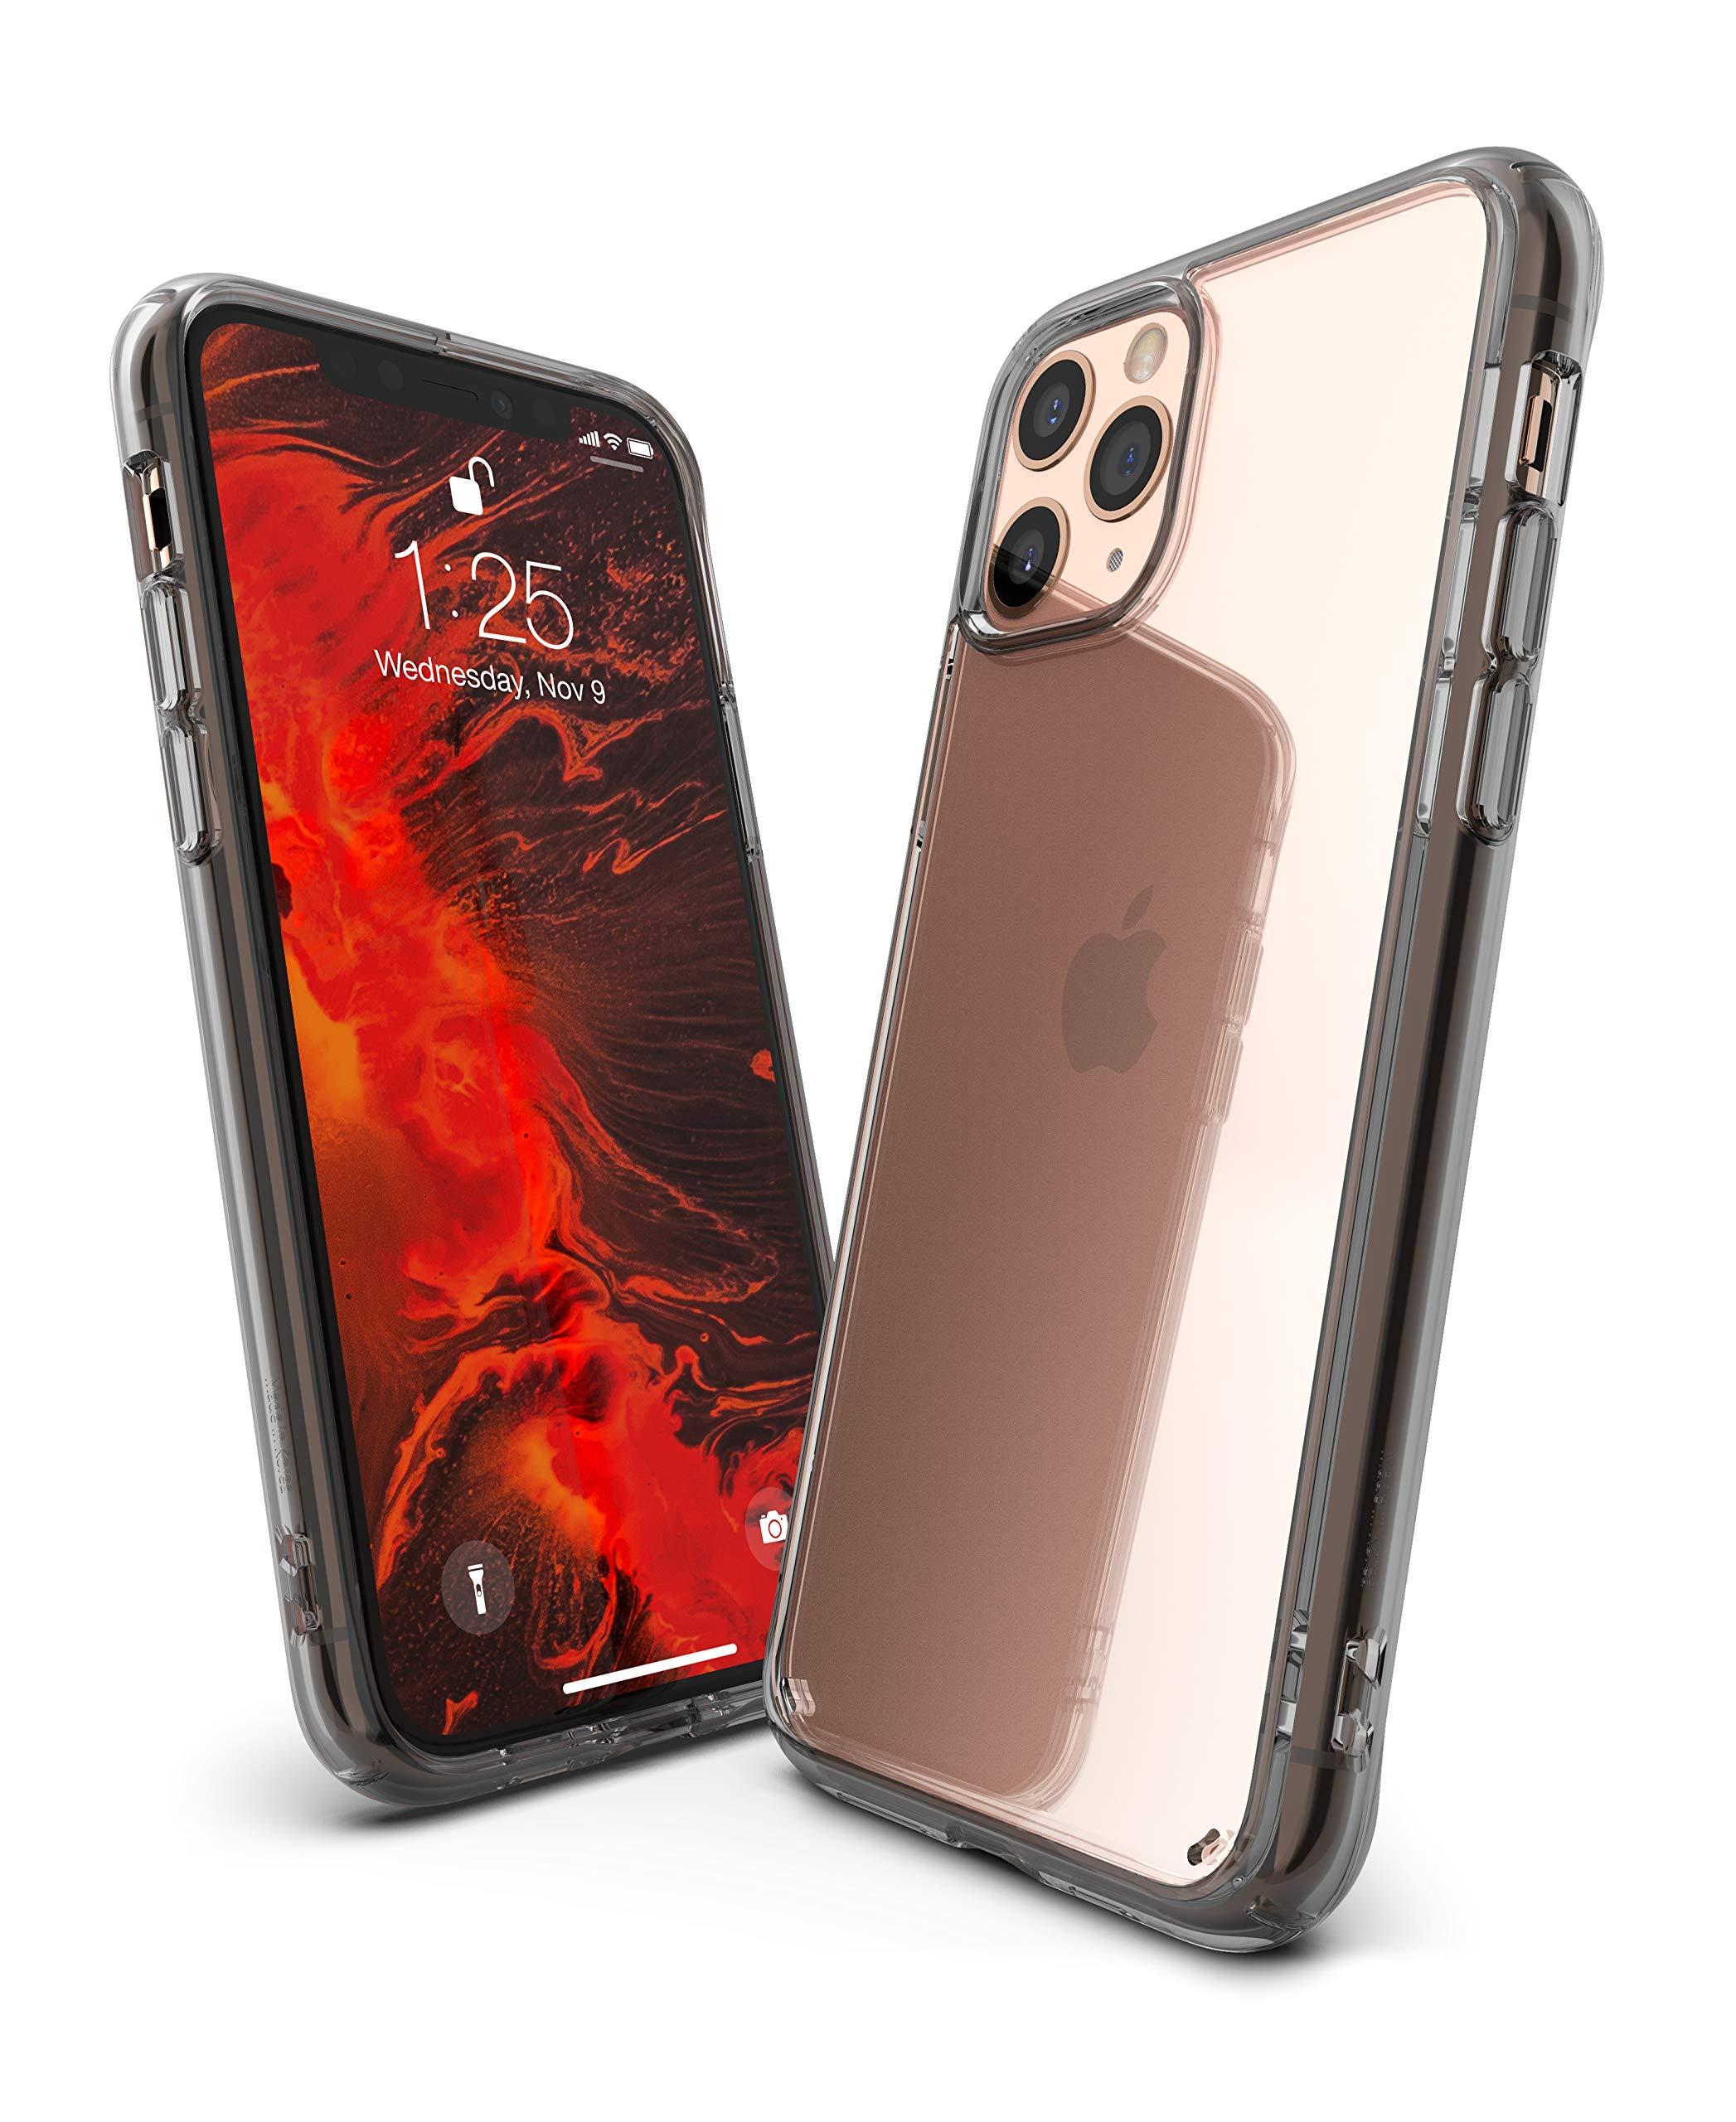 Ringke Fusion Designed for iPhone 11 Pro Max Case (2019) - Smoke Black